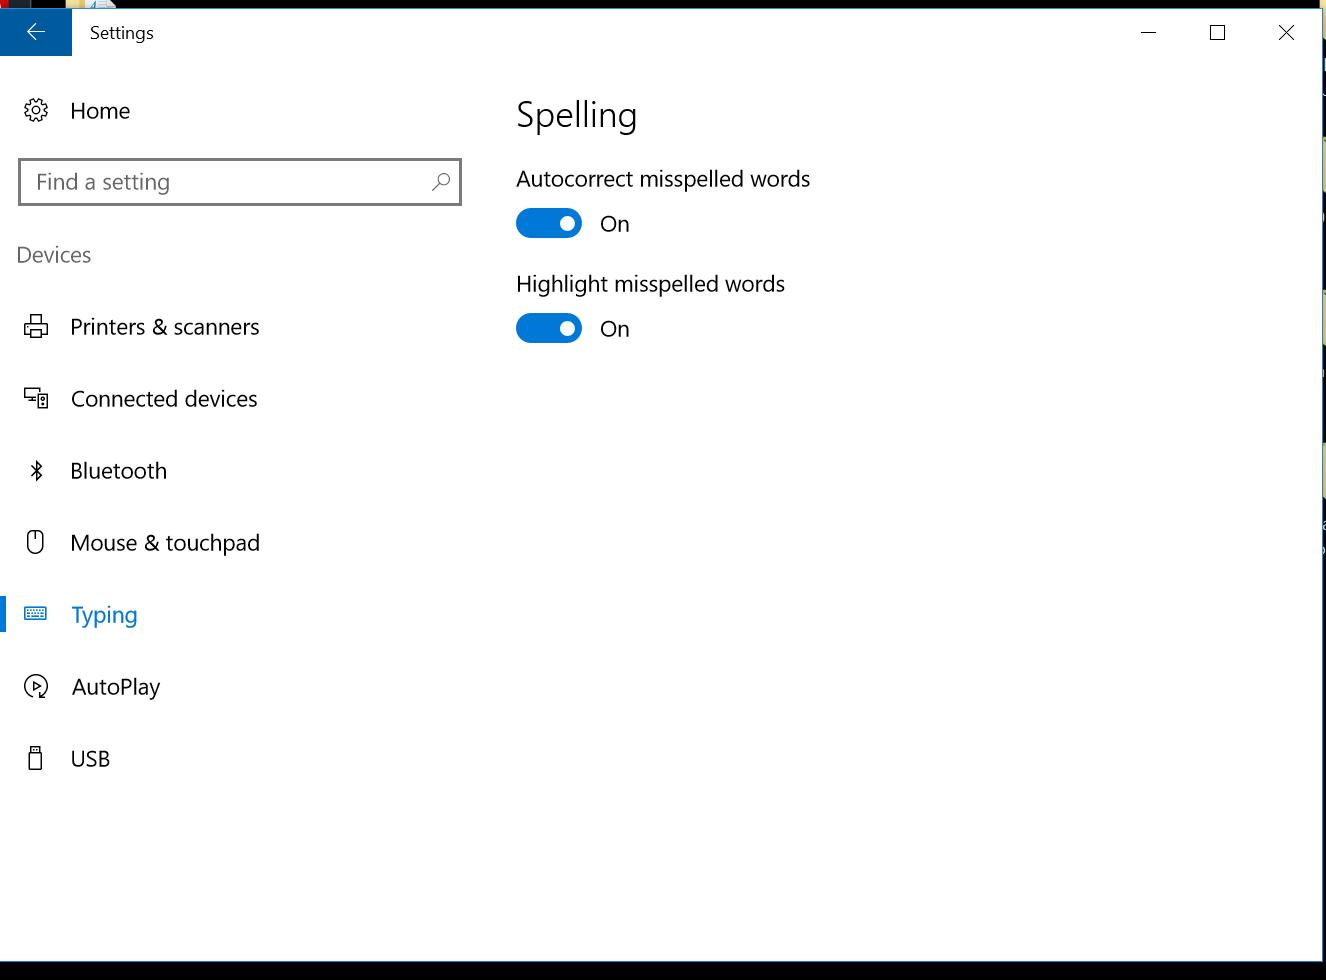 Windows 10 touch keyboard settings missing - Microsoft Community